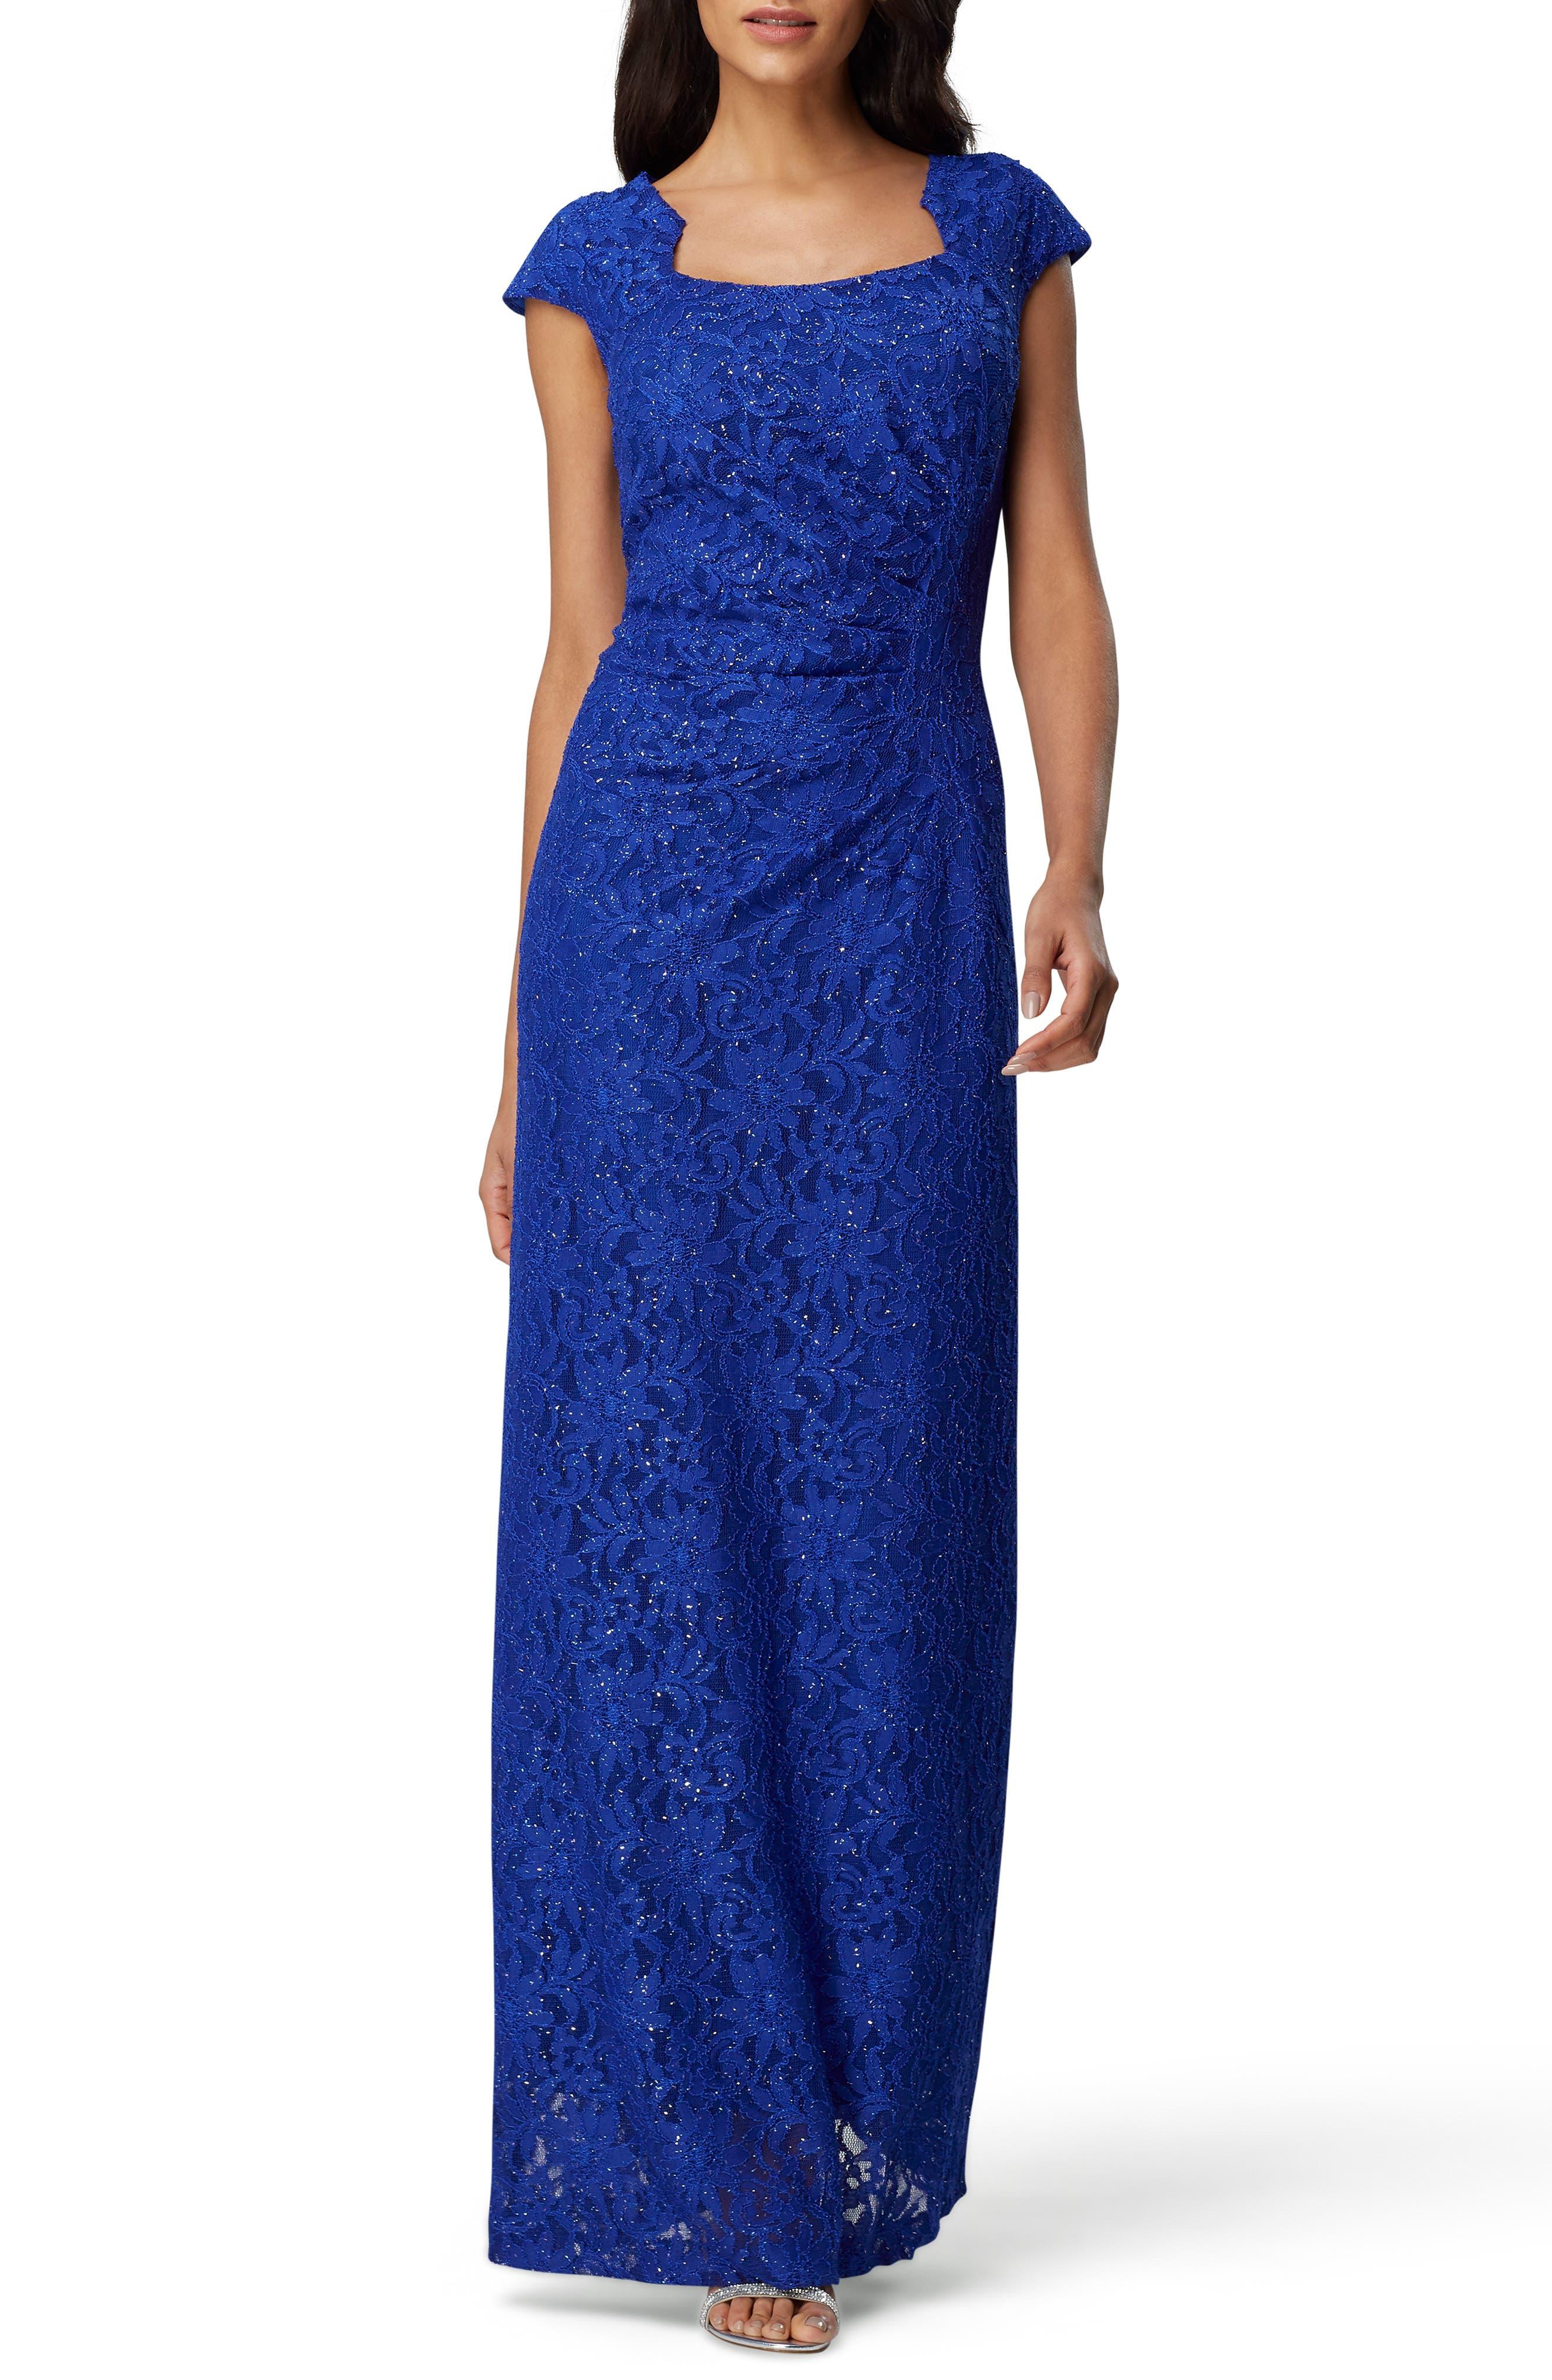 Tahari Lace Cap Sleeve Gown, Blue